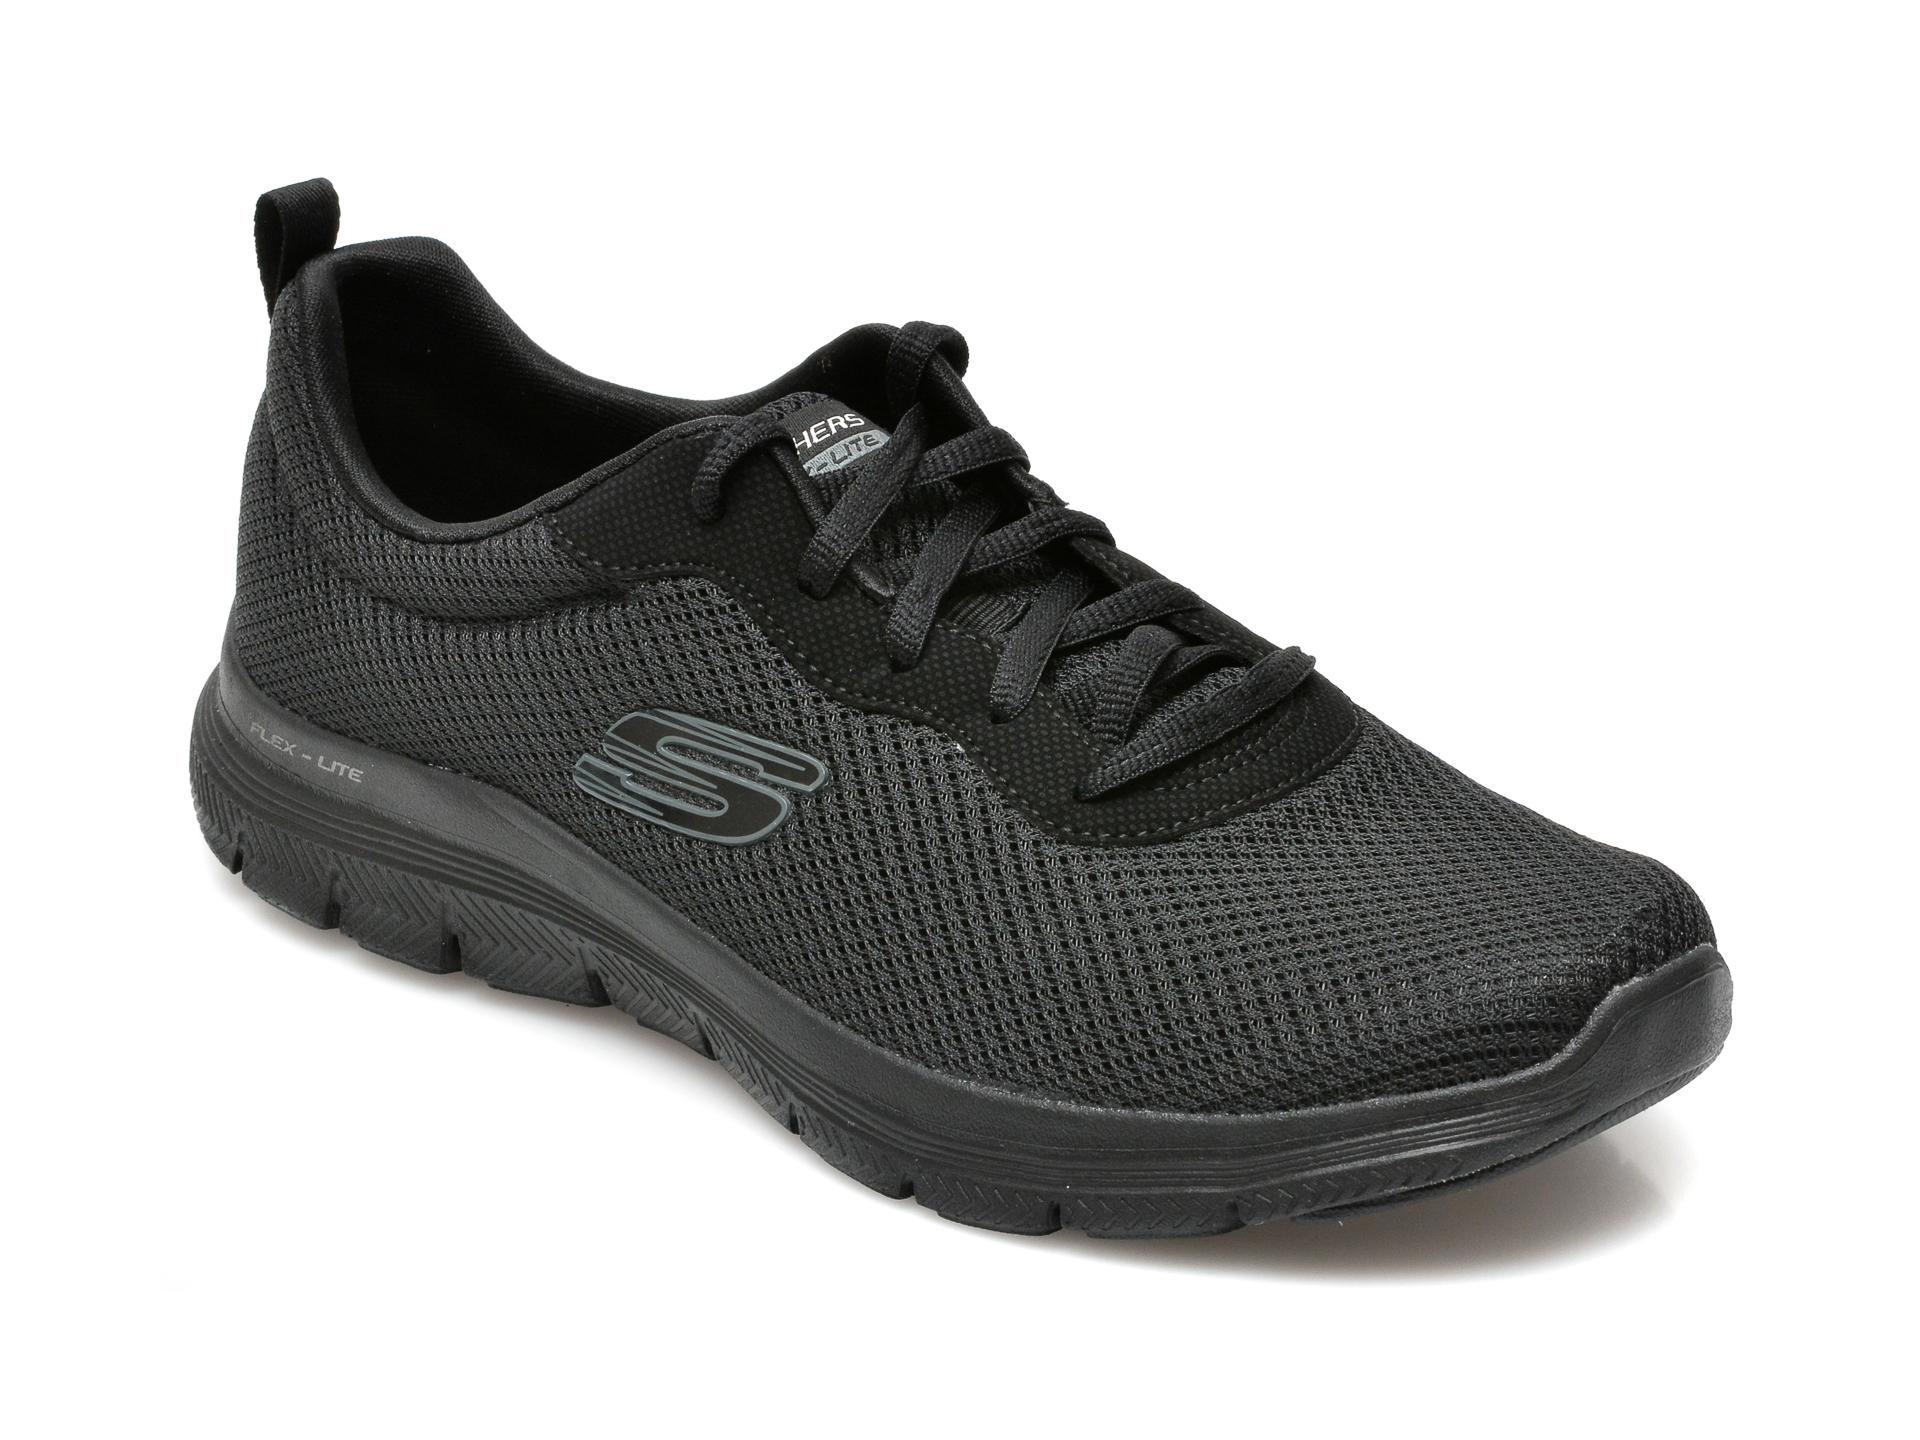 Pantofi SKECHERS negri, FLEX APPEAL 4.0, din material textil imagine 2021 otter.ro